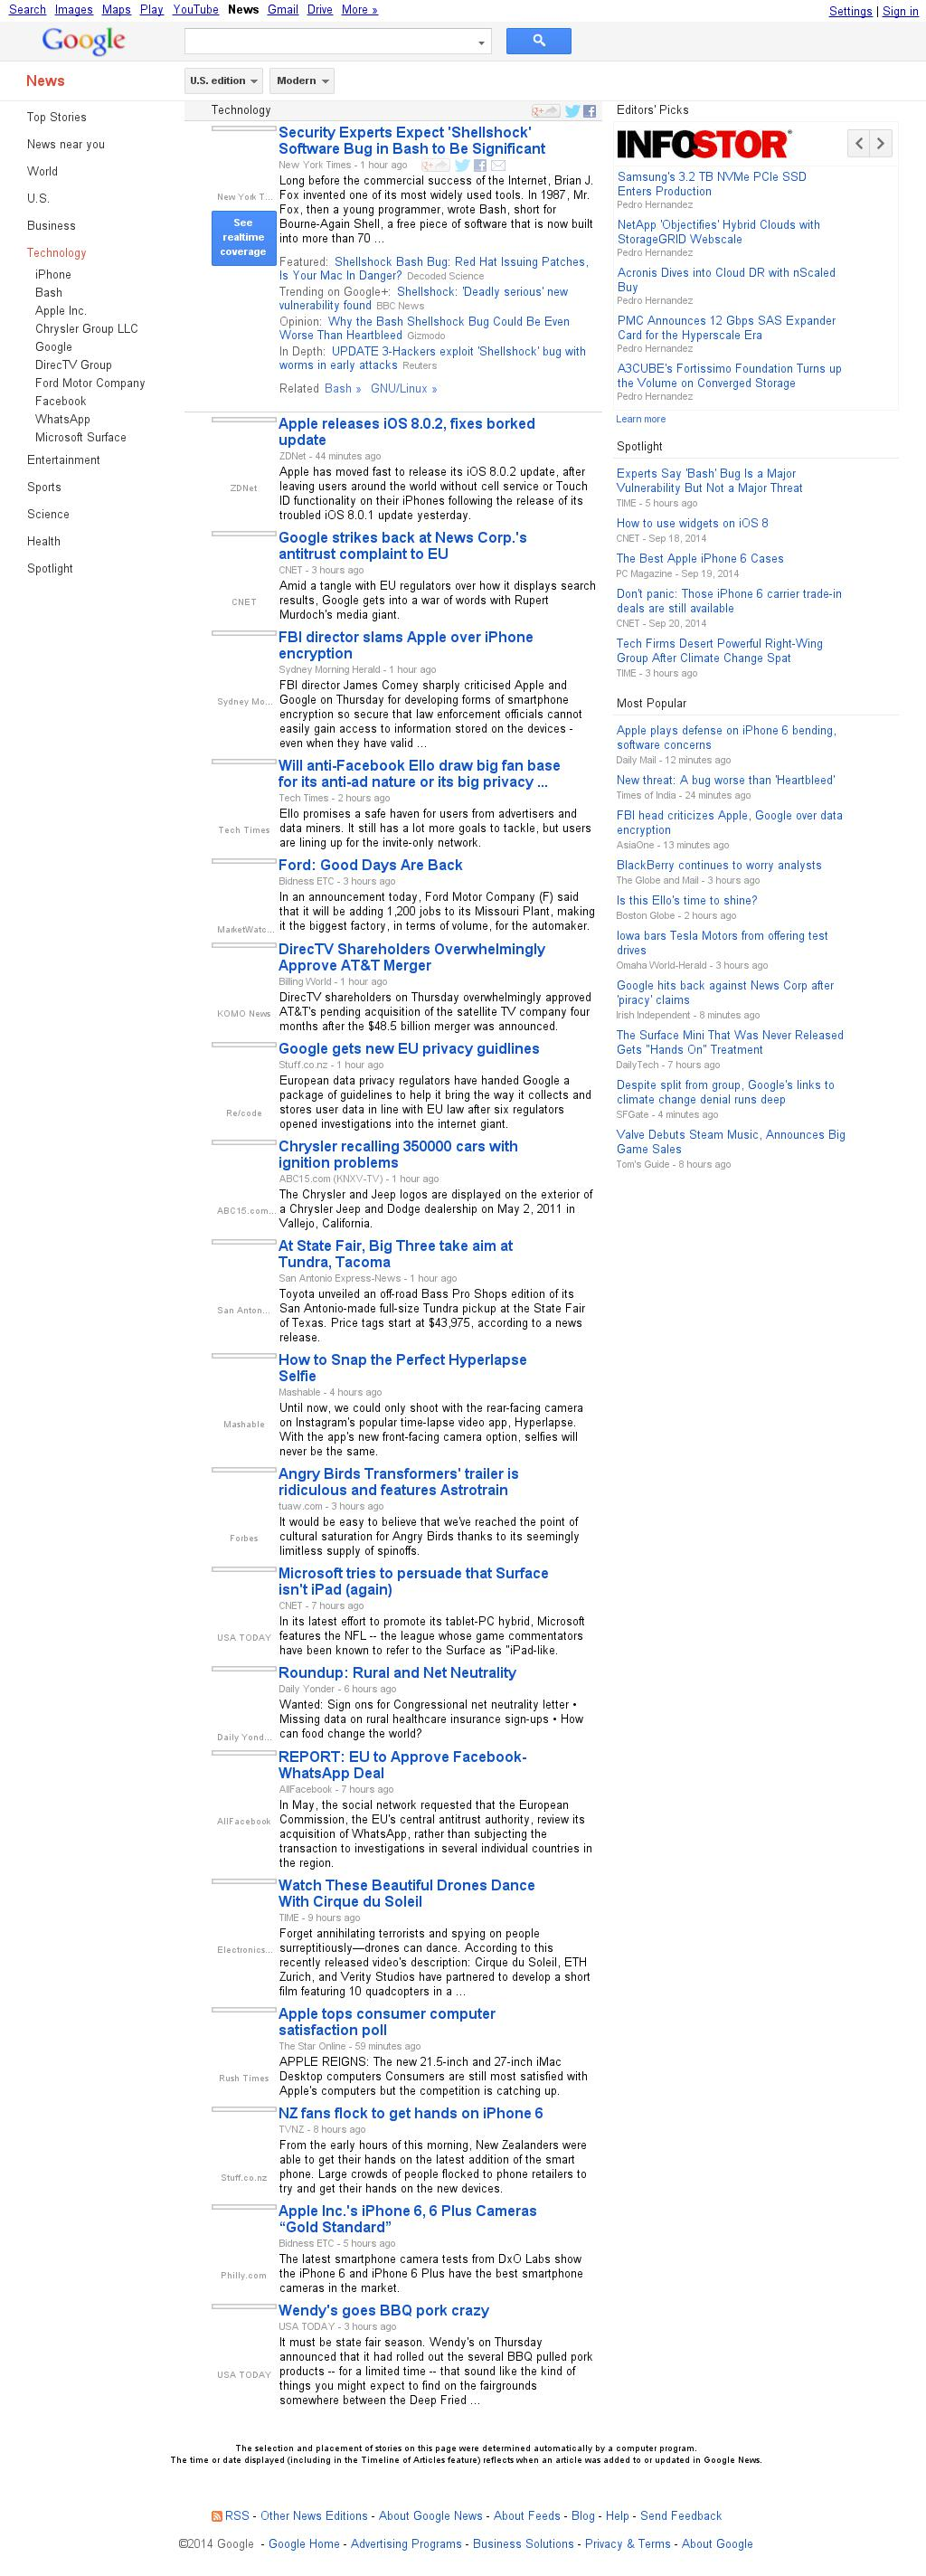 Google News: Technology at Friday Sept. 26, 2014, 2:09 a.m. UTC